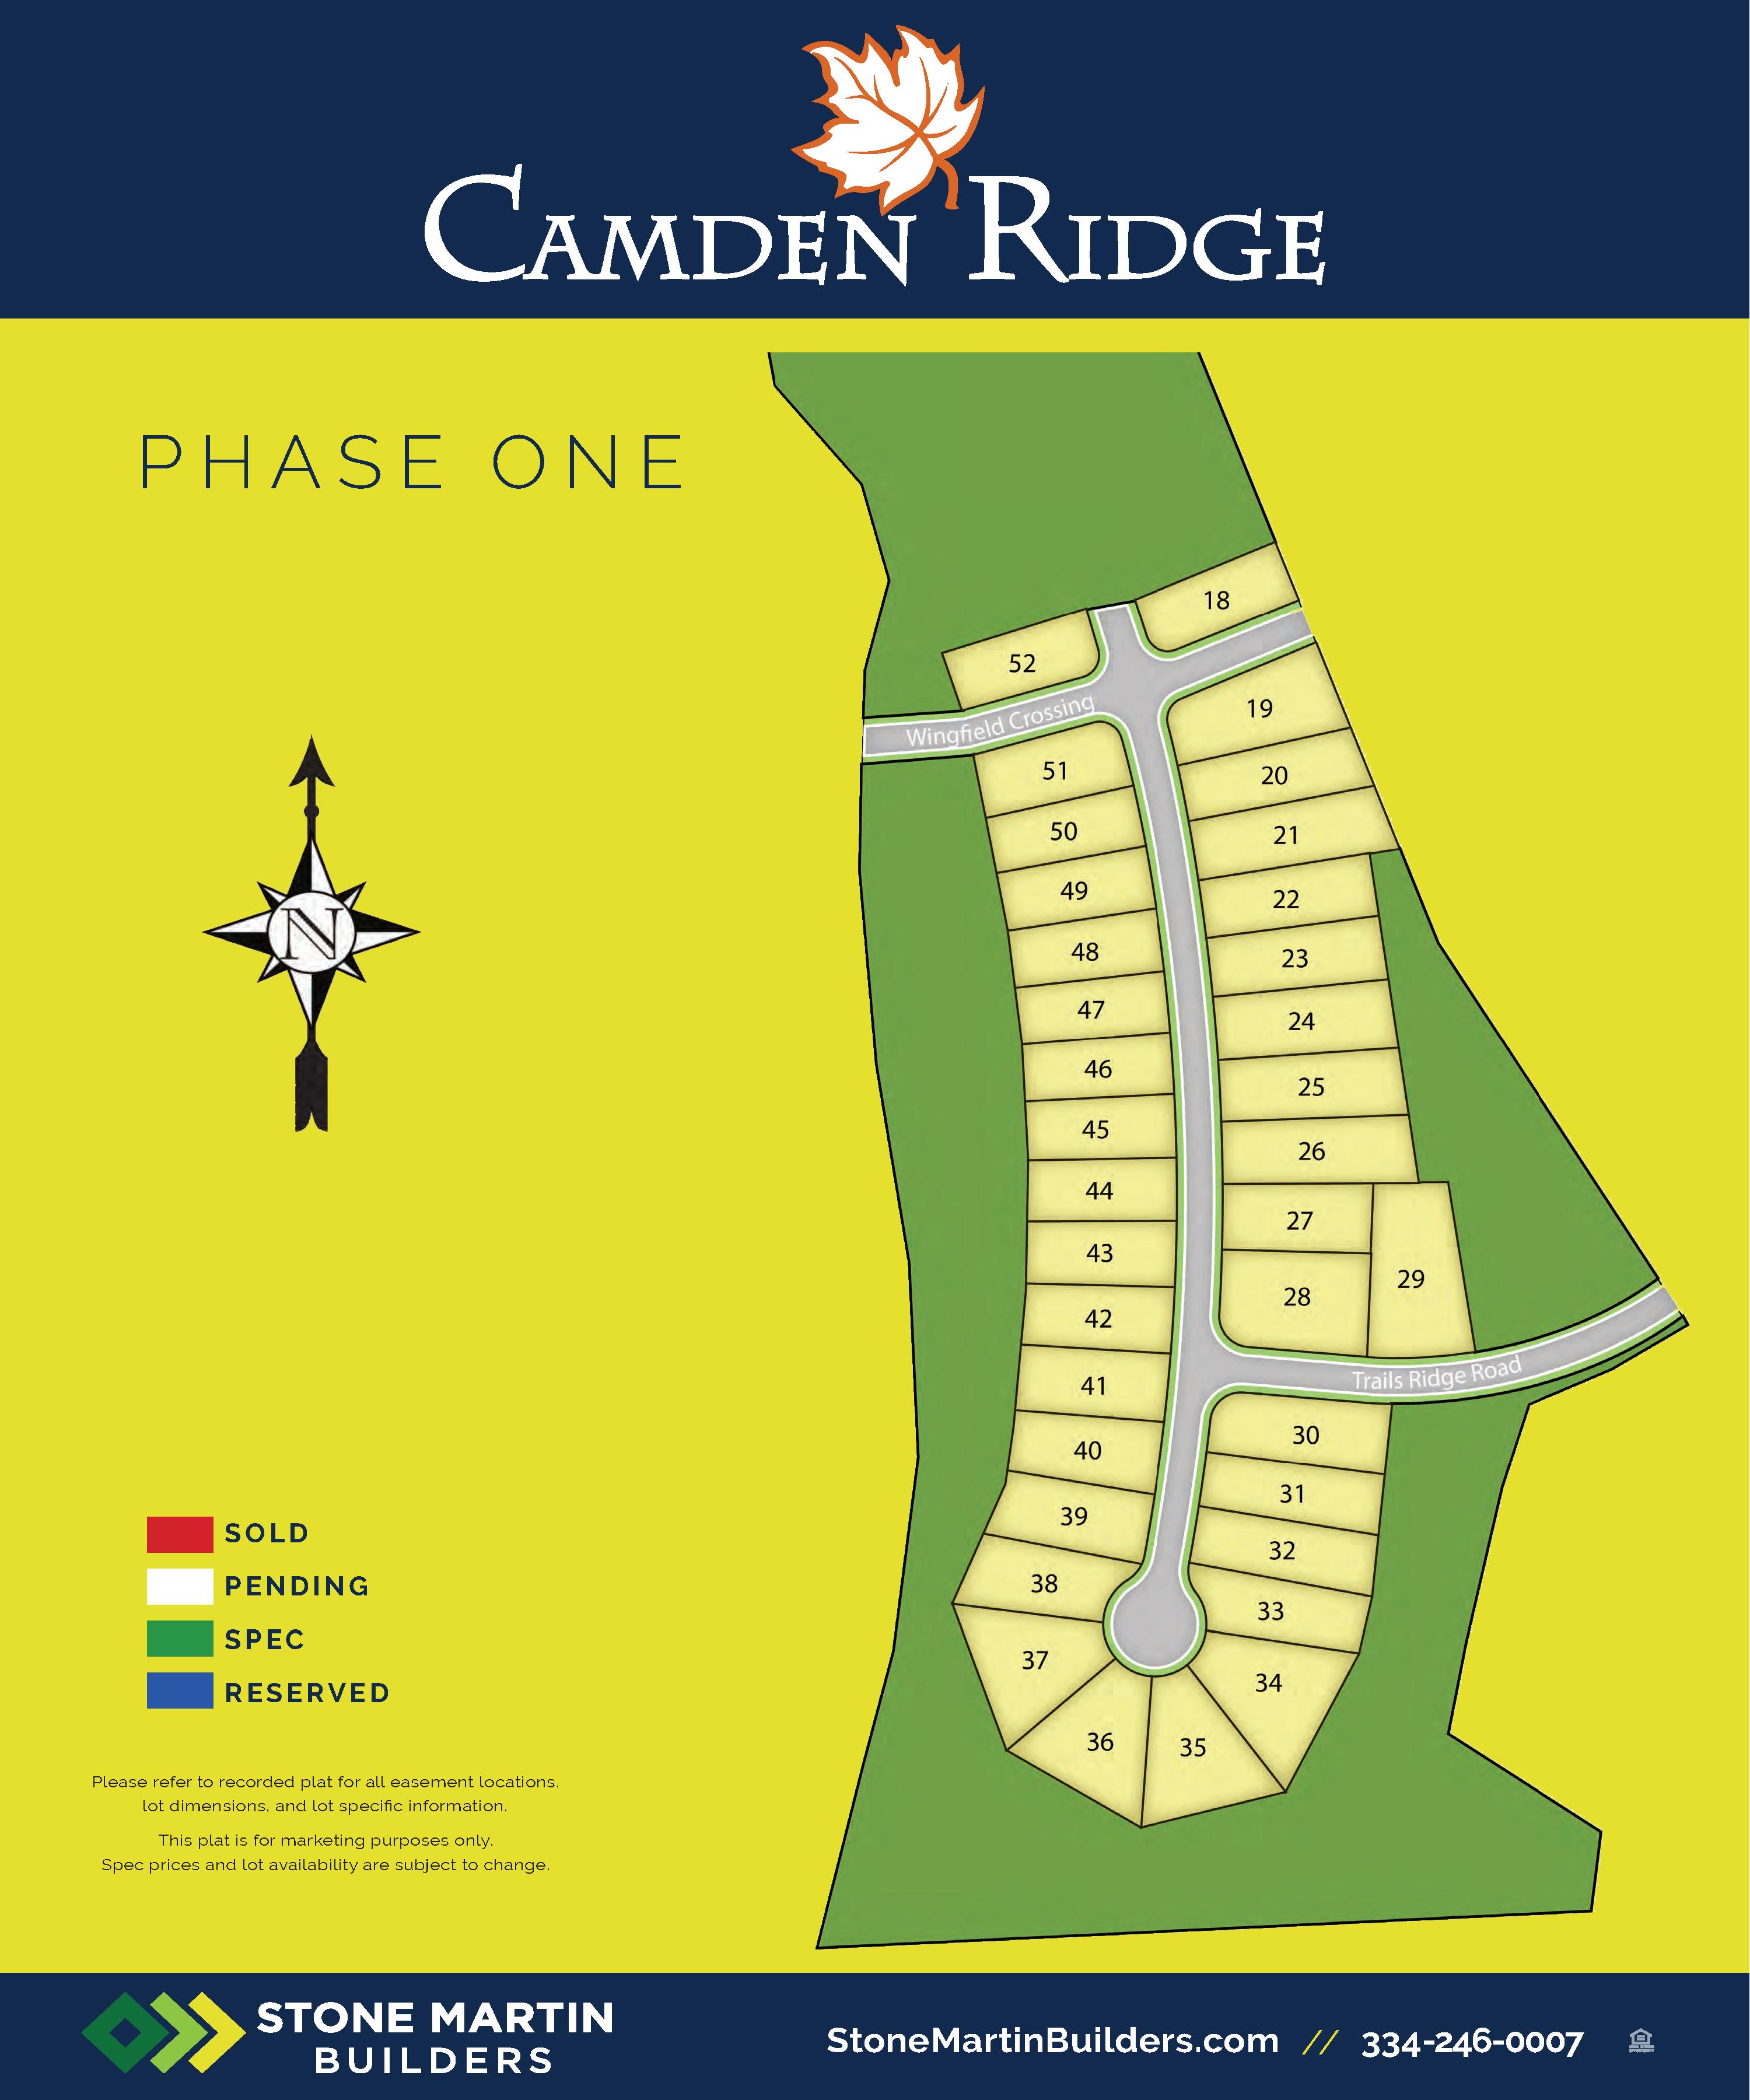 Auburn, AL Camden Ridge New Homes from Stone Martin Builders